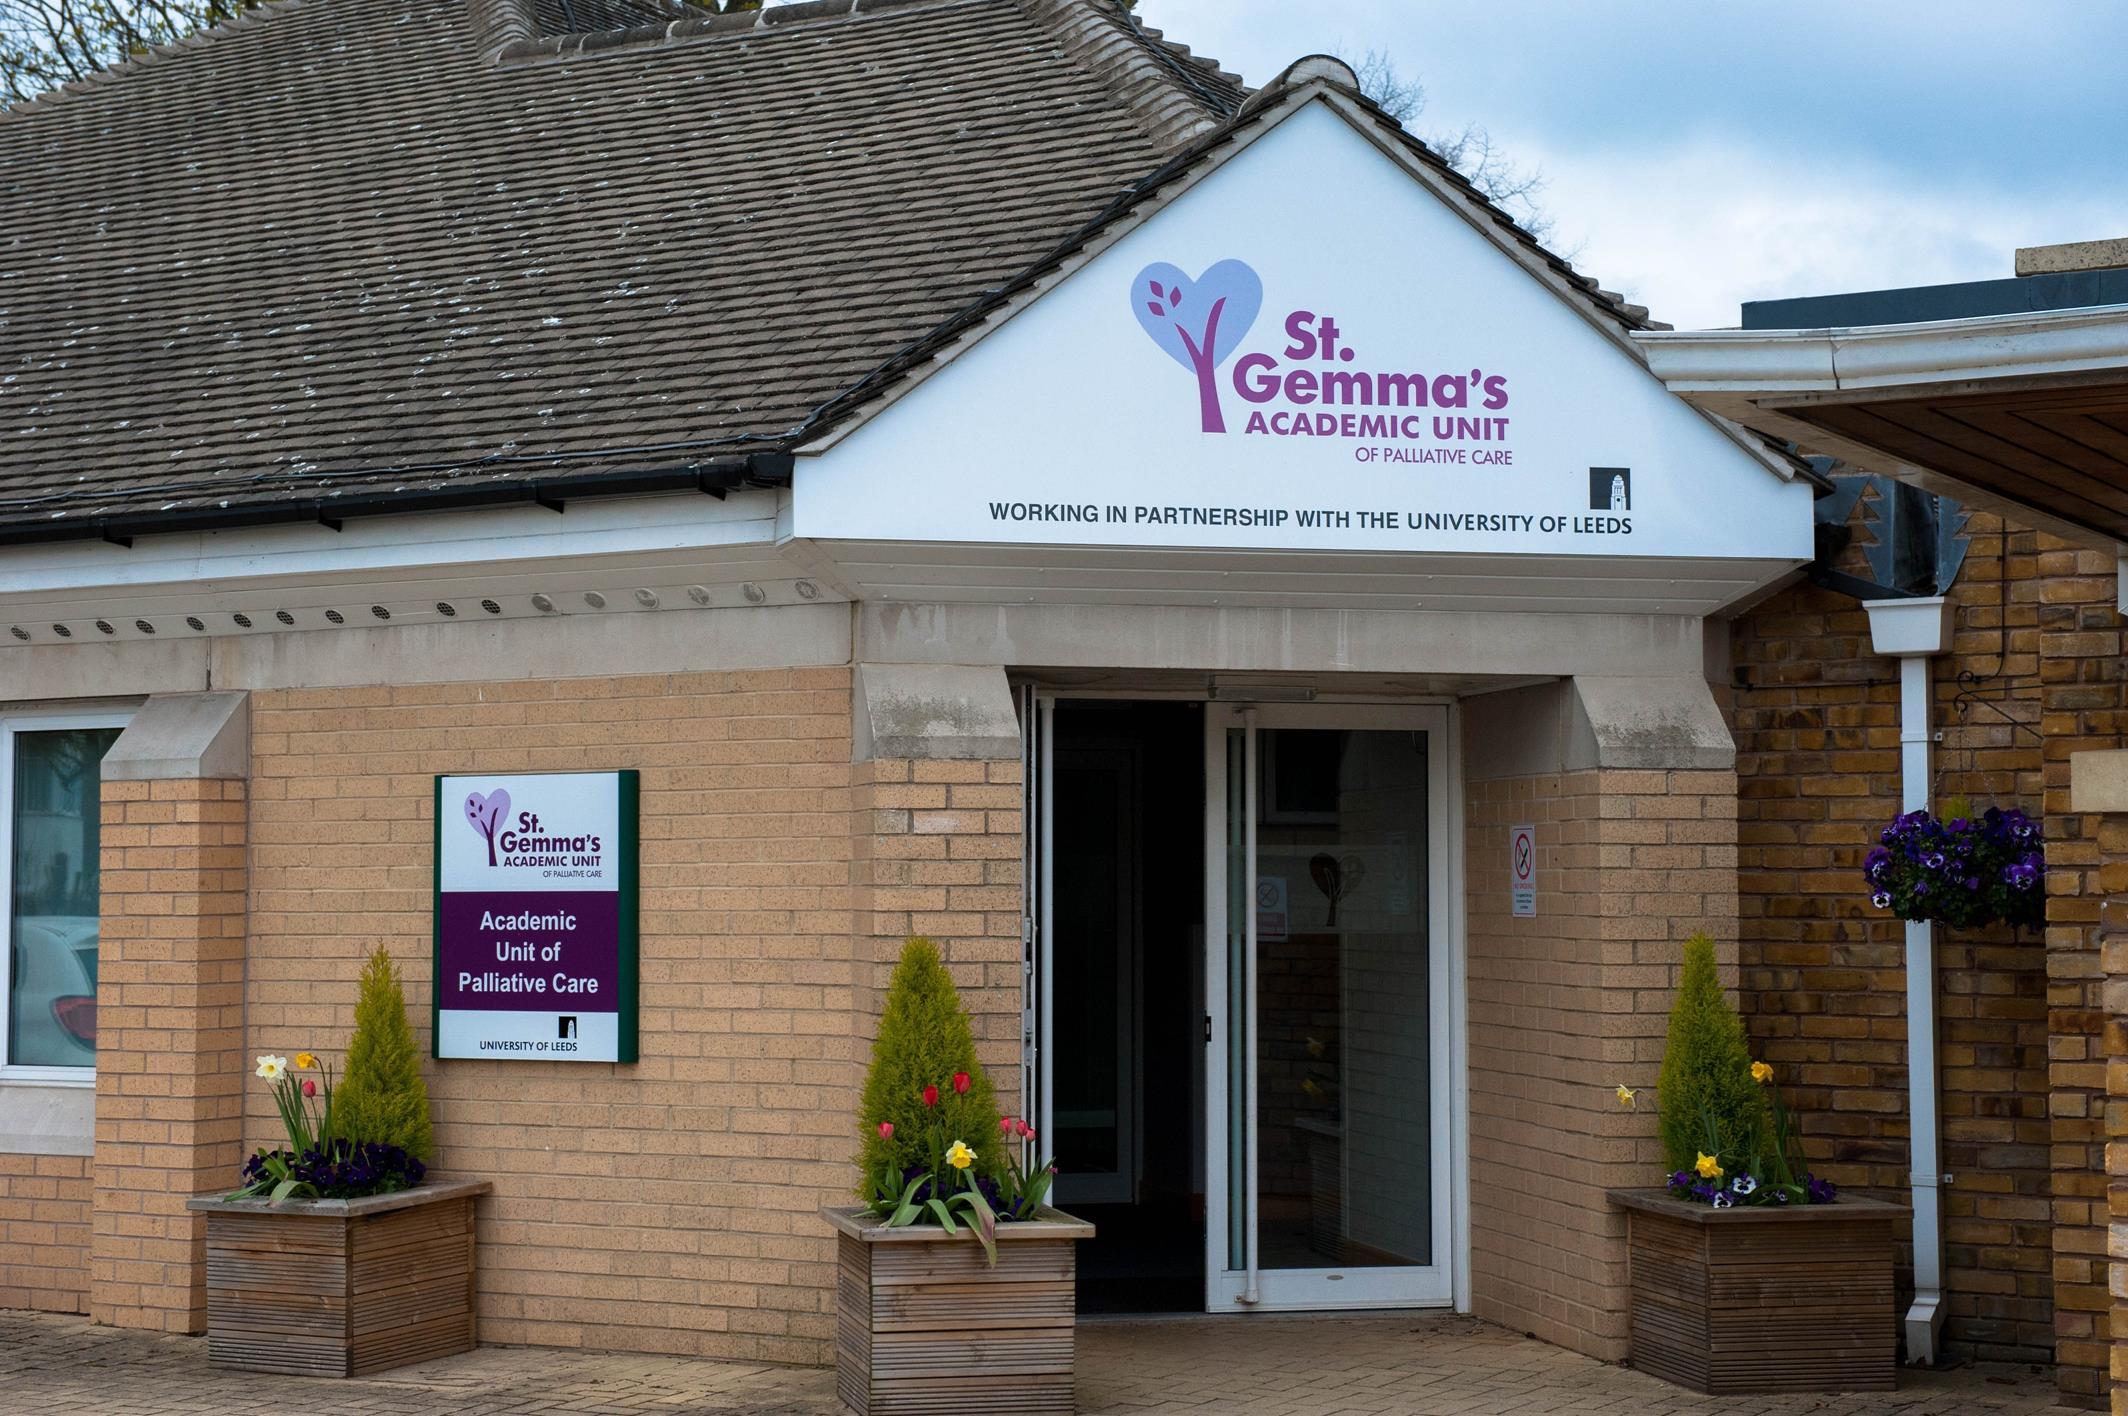 St Gemma's Academic Unit of Palliative Care